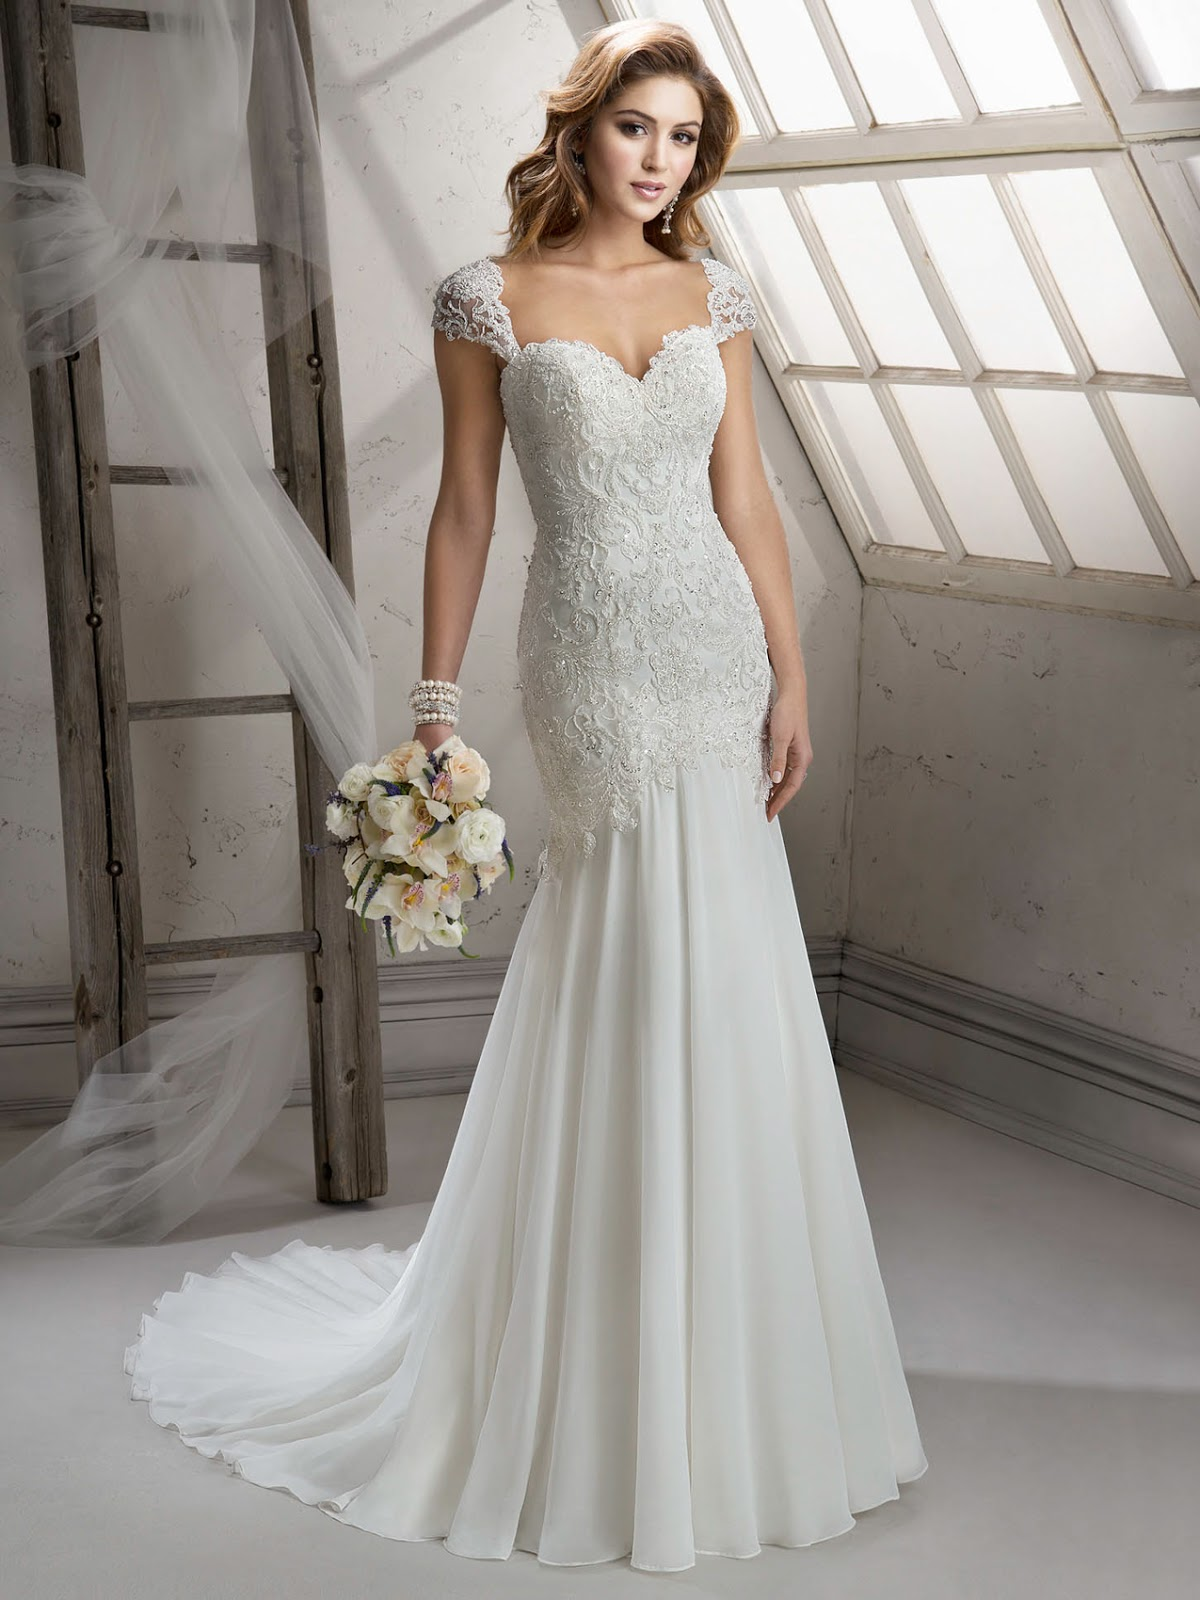 Is Designer Wedding Dresses New York City Still